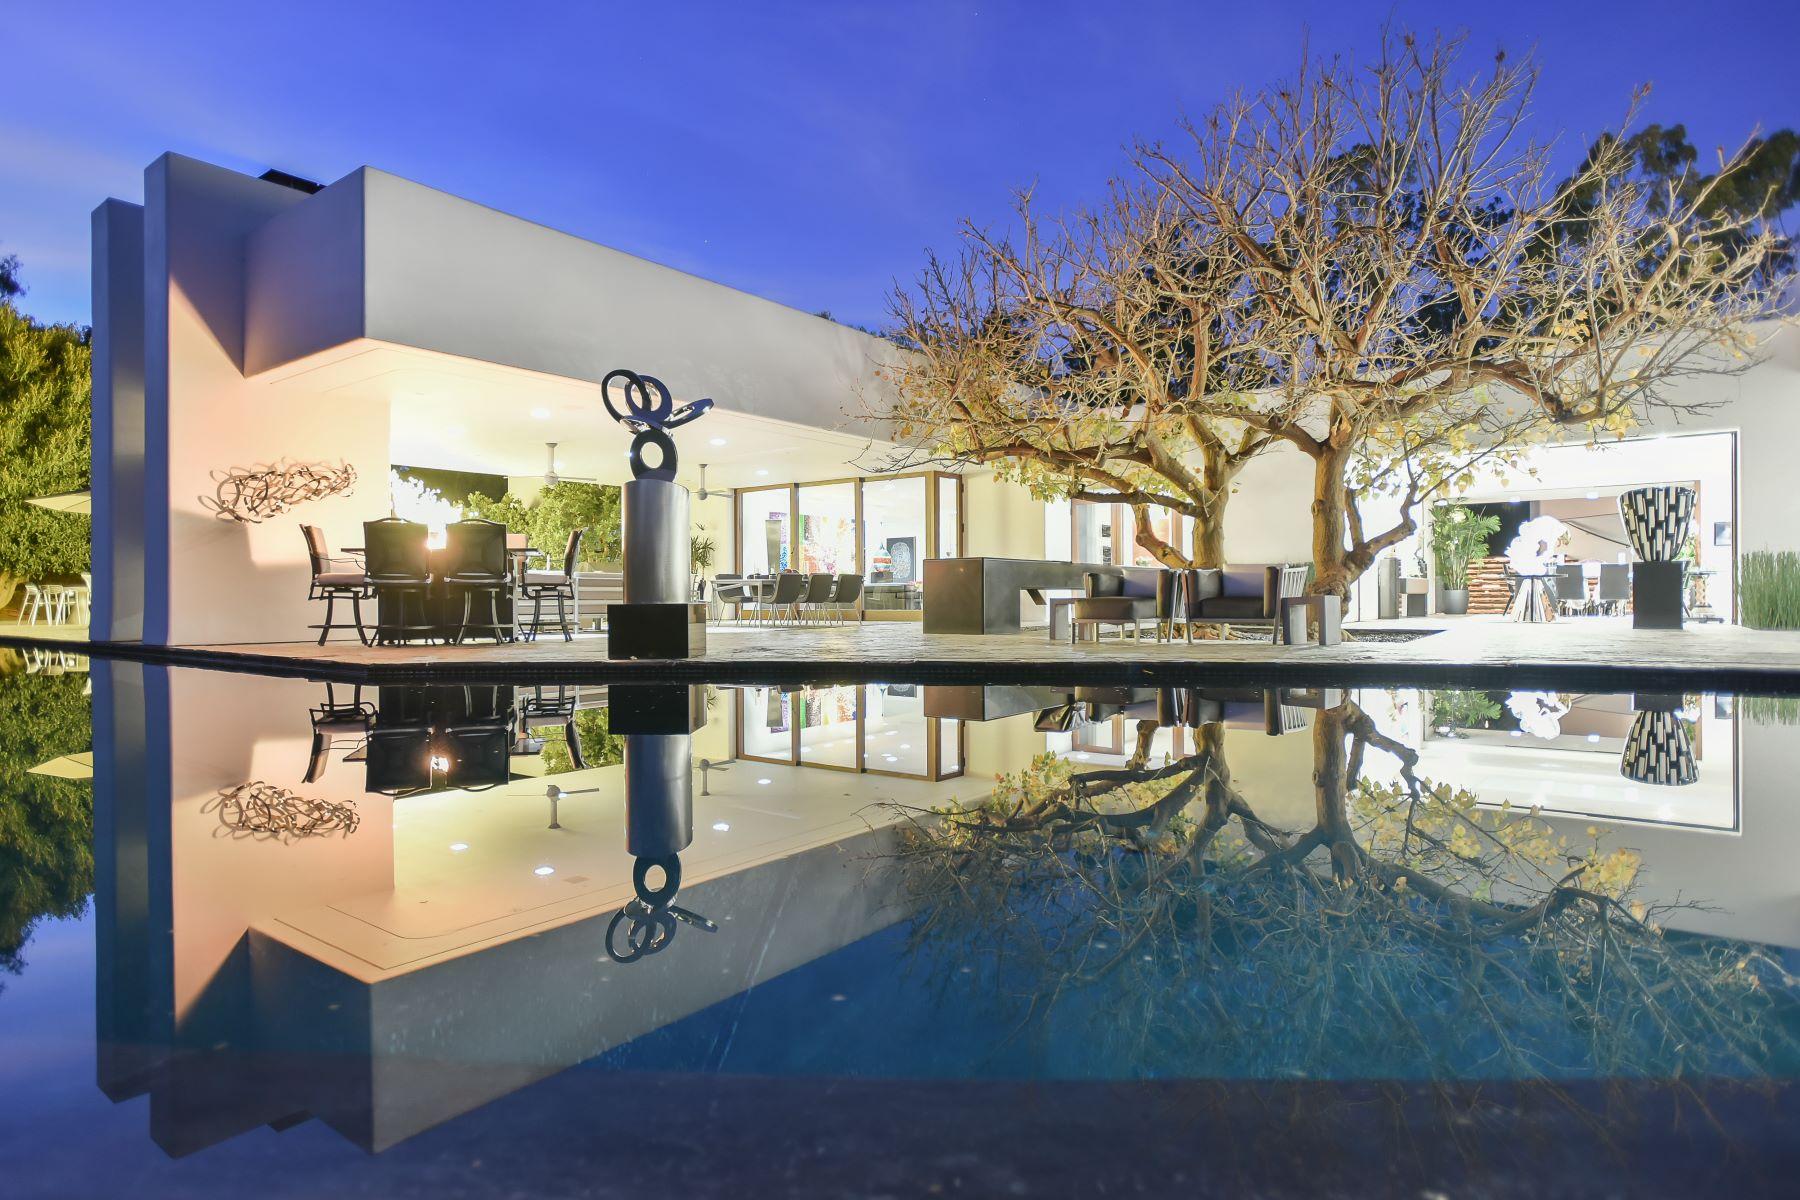 Single Family Homes for Sale at 5410 Los Mirlitos Rancho Santa Fe, California 92067 United States